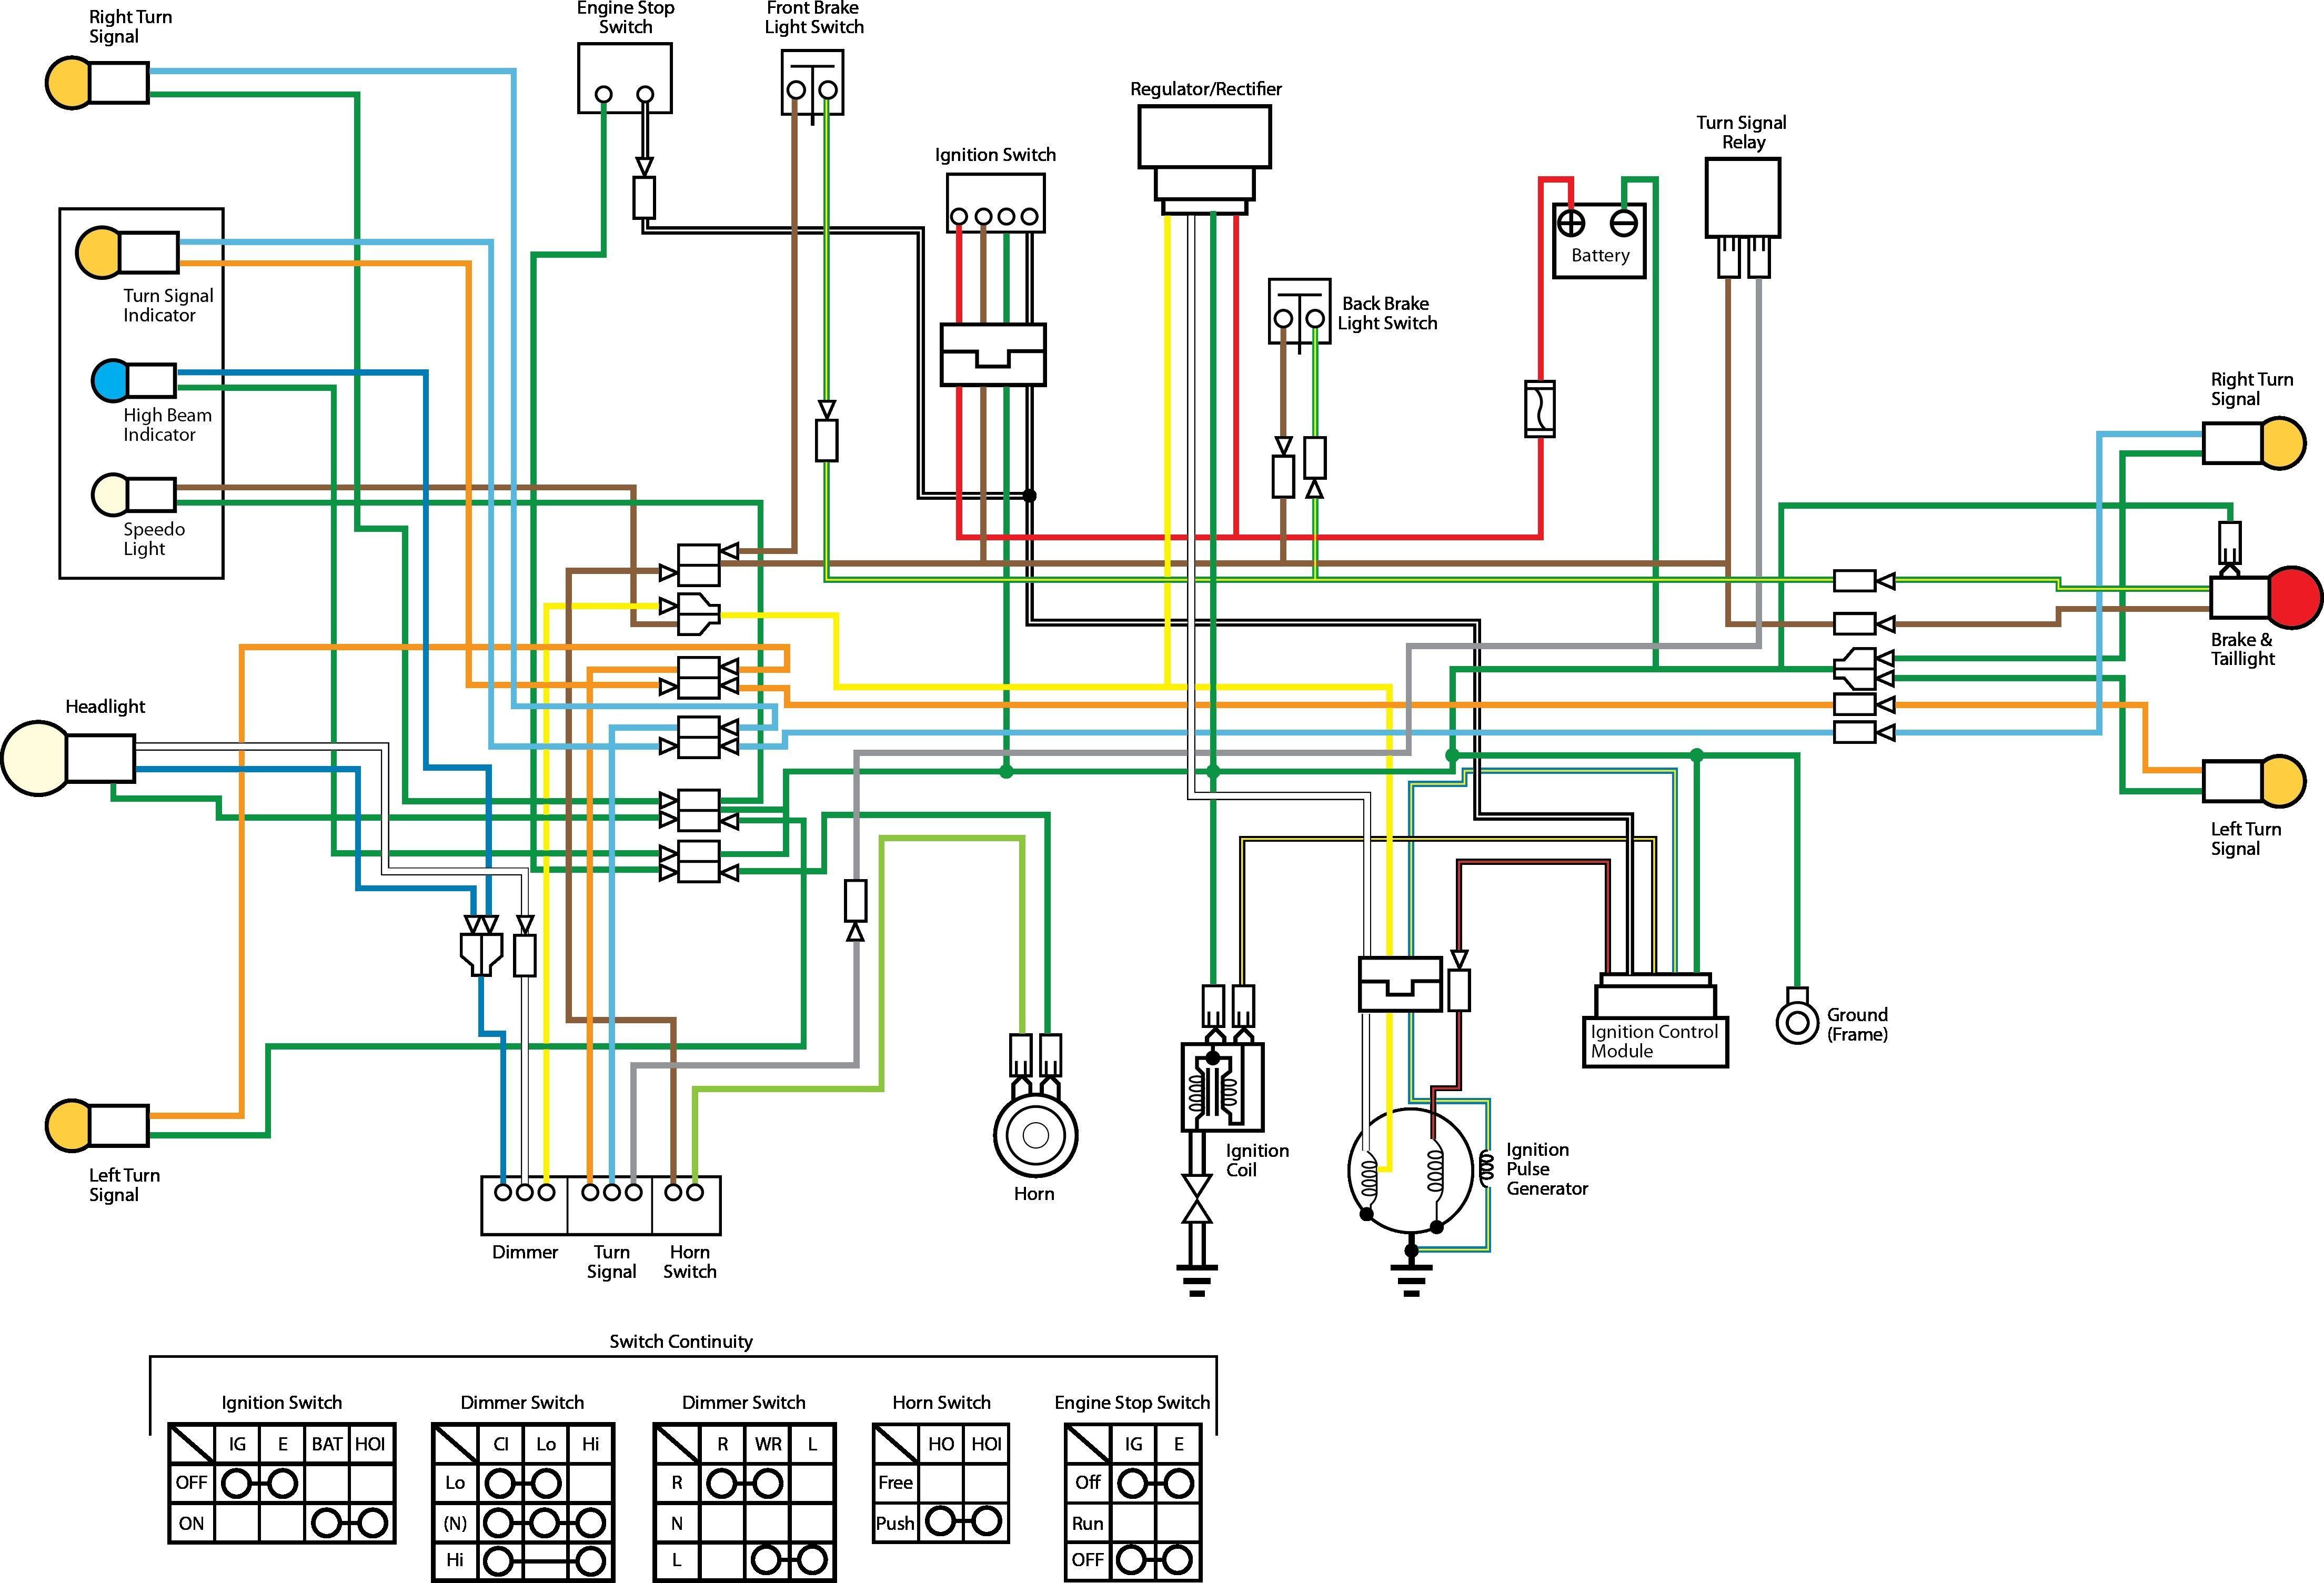 [DIAGRAM_5LK]  Triumph Speedmaster Wiring Diagram - Speakon Nl4fx Wiring Diagram for Wiring  Diagram Schematics | Triumph Speedmaster Wiring Diagram |  | Wiring Diagram Schematics